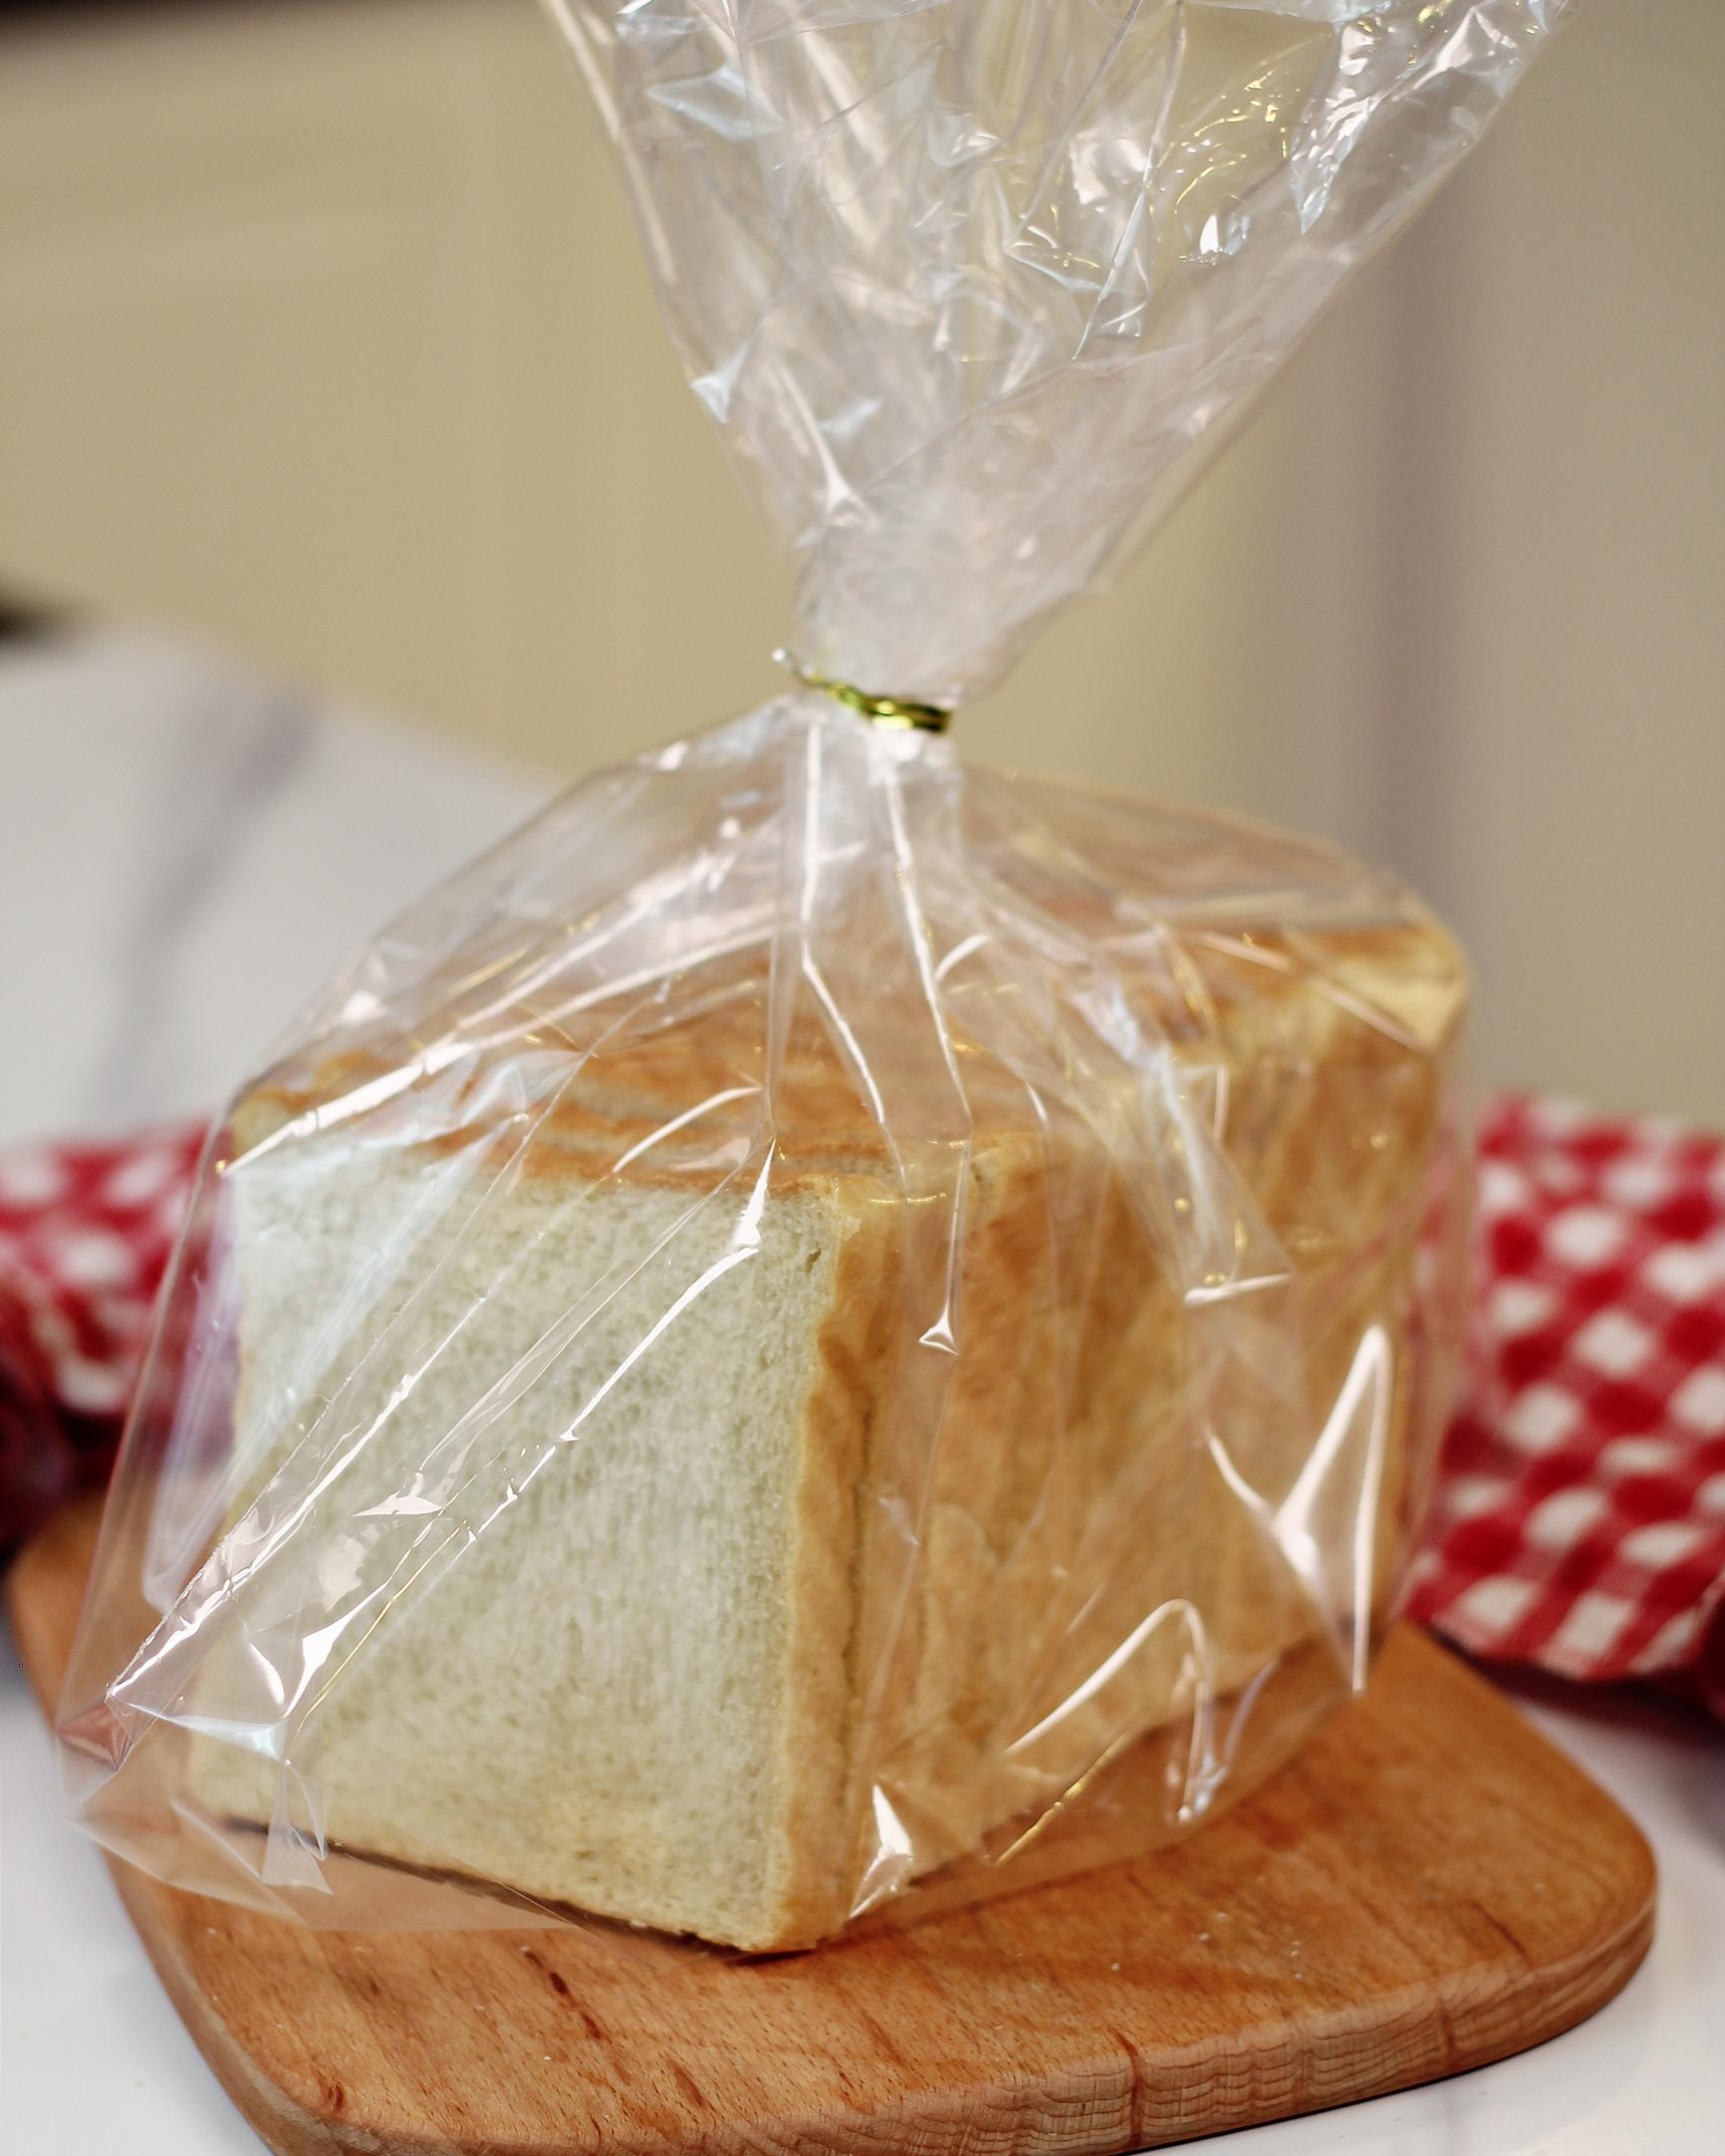 Vegan White Bread (Eggless & Dairy-free) recipe